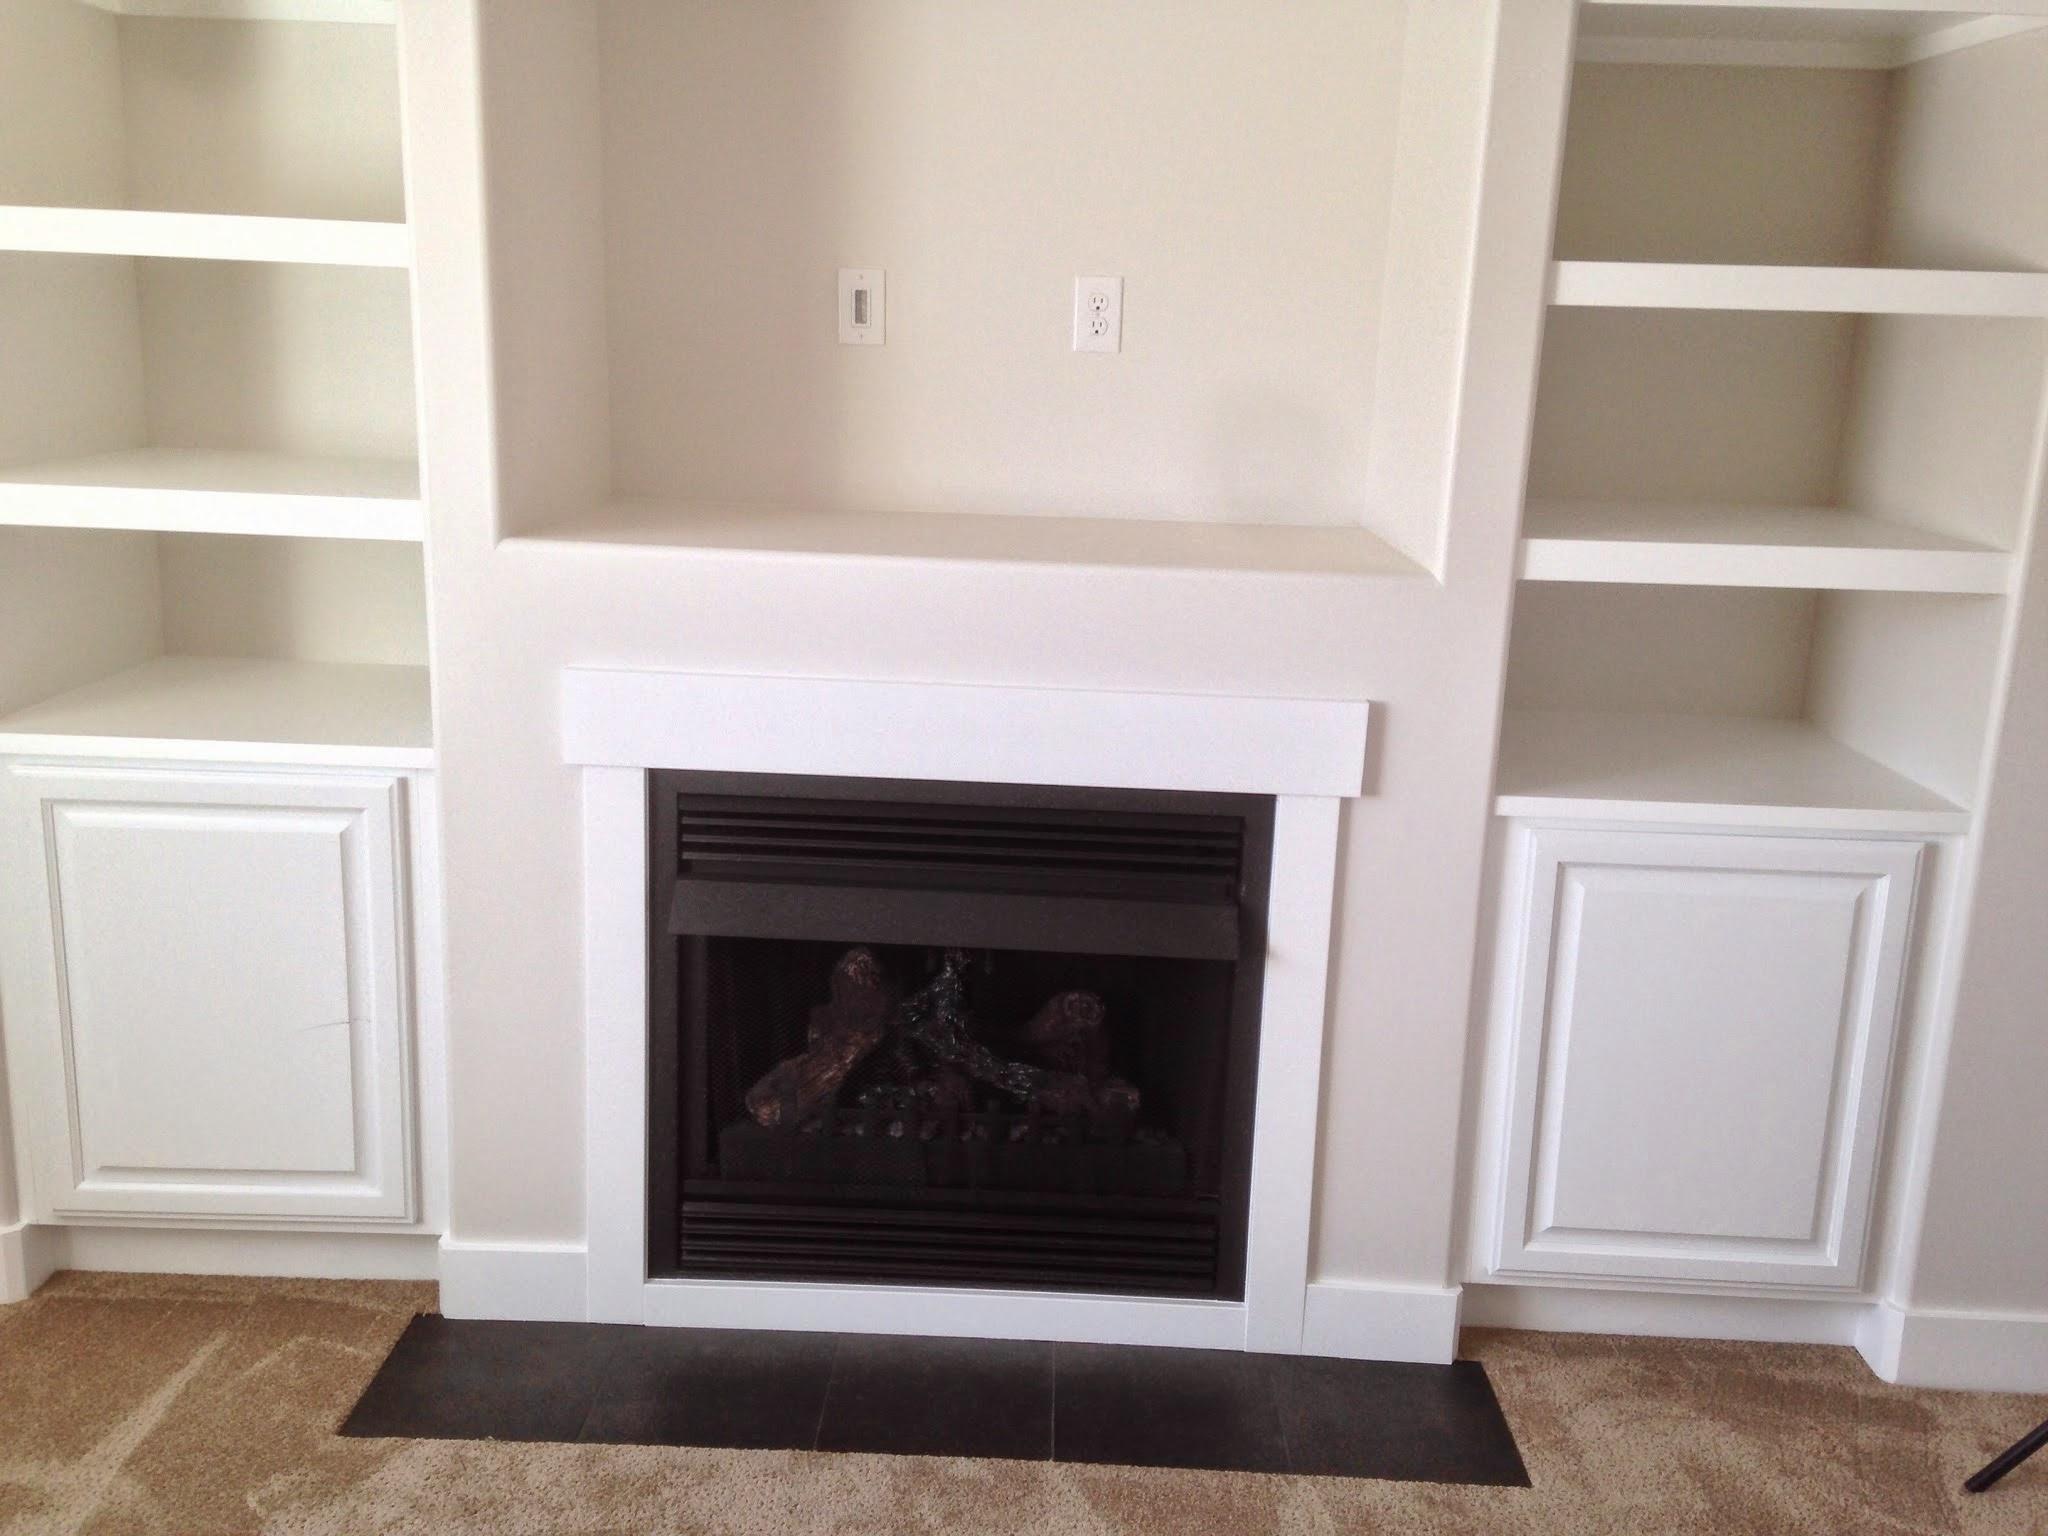 fireplace renovation salt lake city utah jpg  Fireplace Remodeling Utah  Basement Company. Home Remodel Salt Lake City